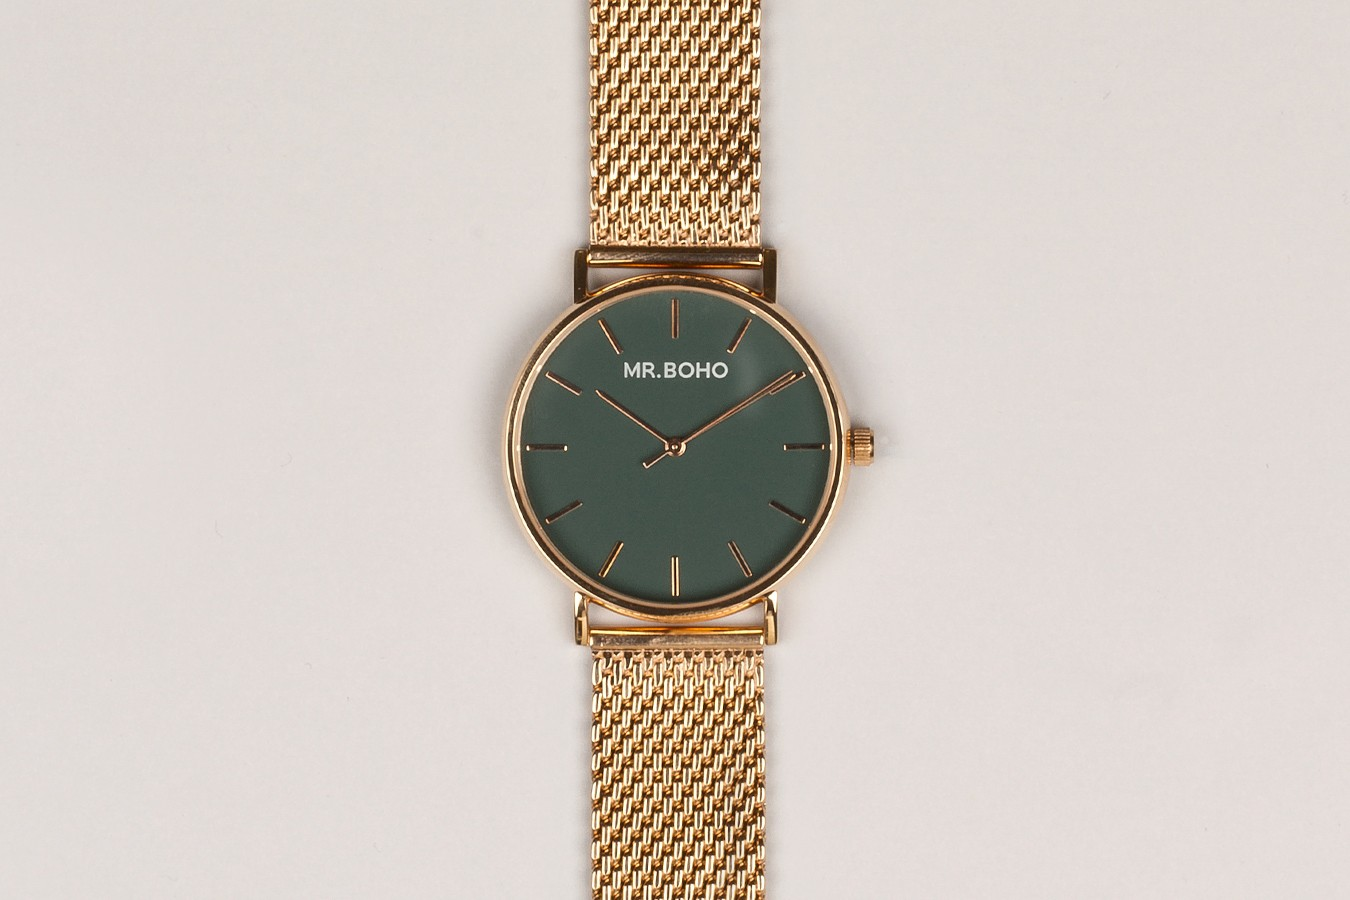 Green Metallic Copper - Watches | Mr. Boho